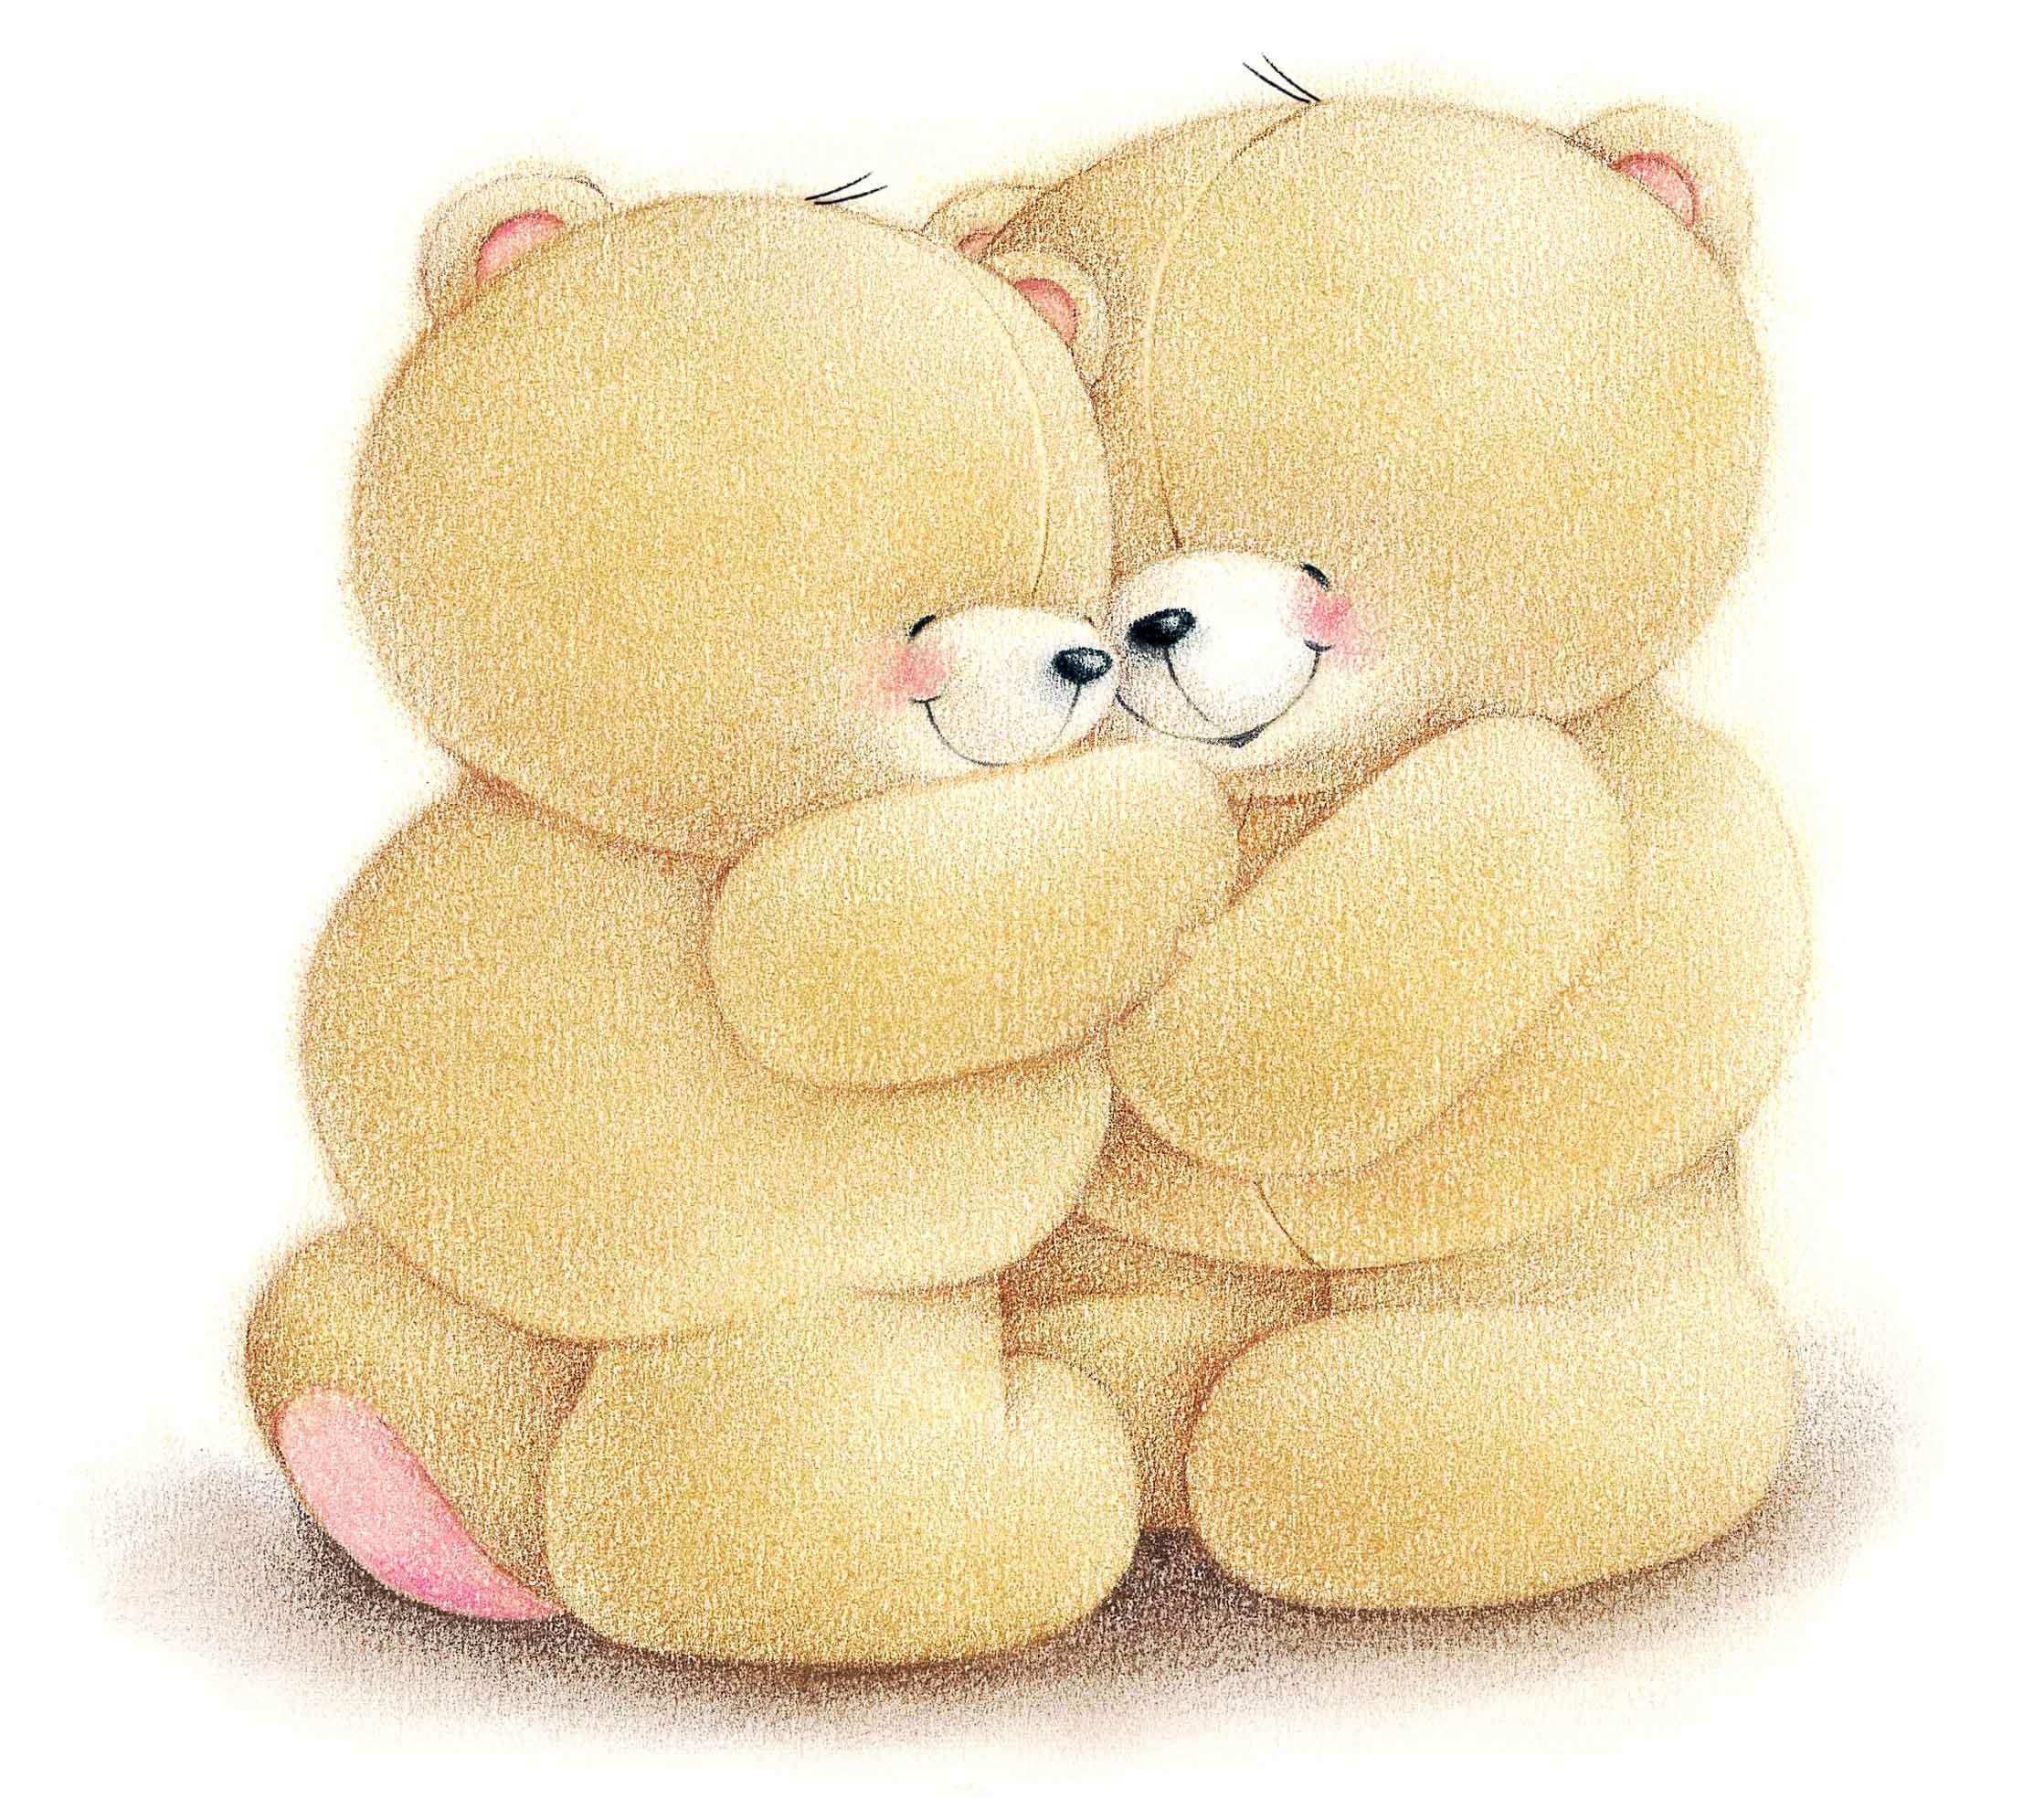 обнимающиеся медвежата картинки примеру